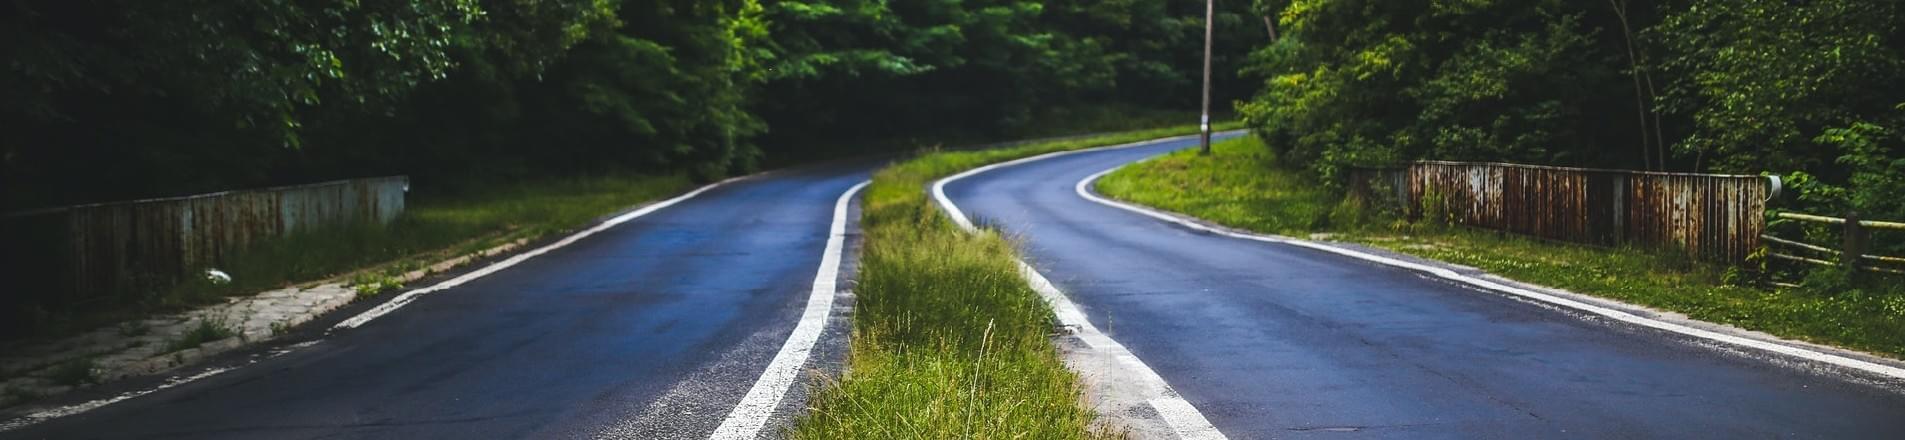 Department for Transport: Promoting green transport